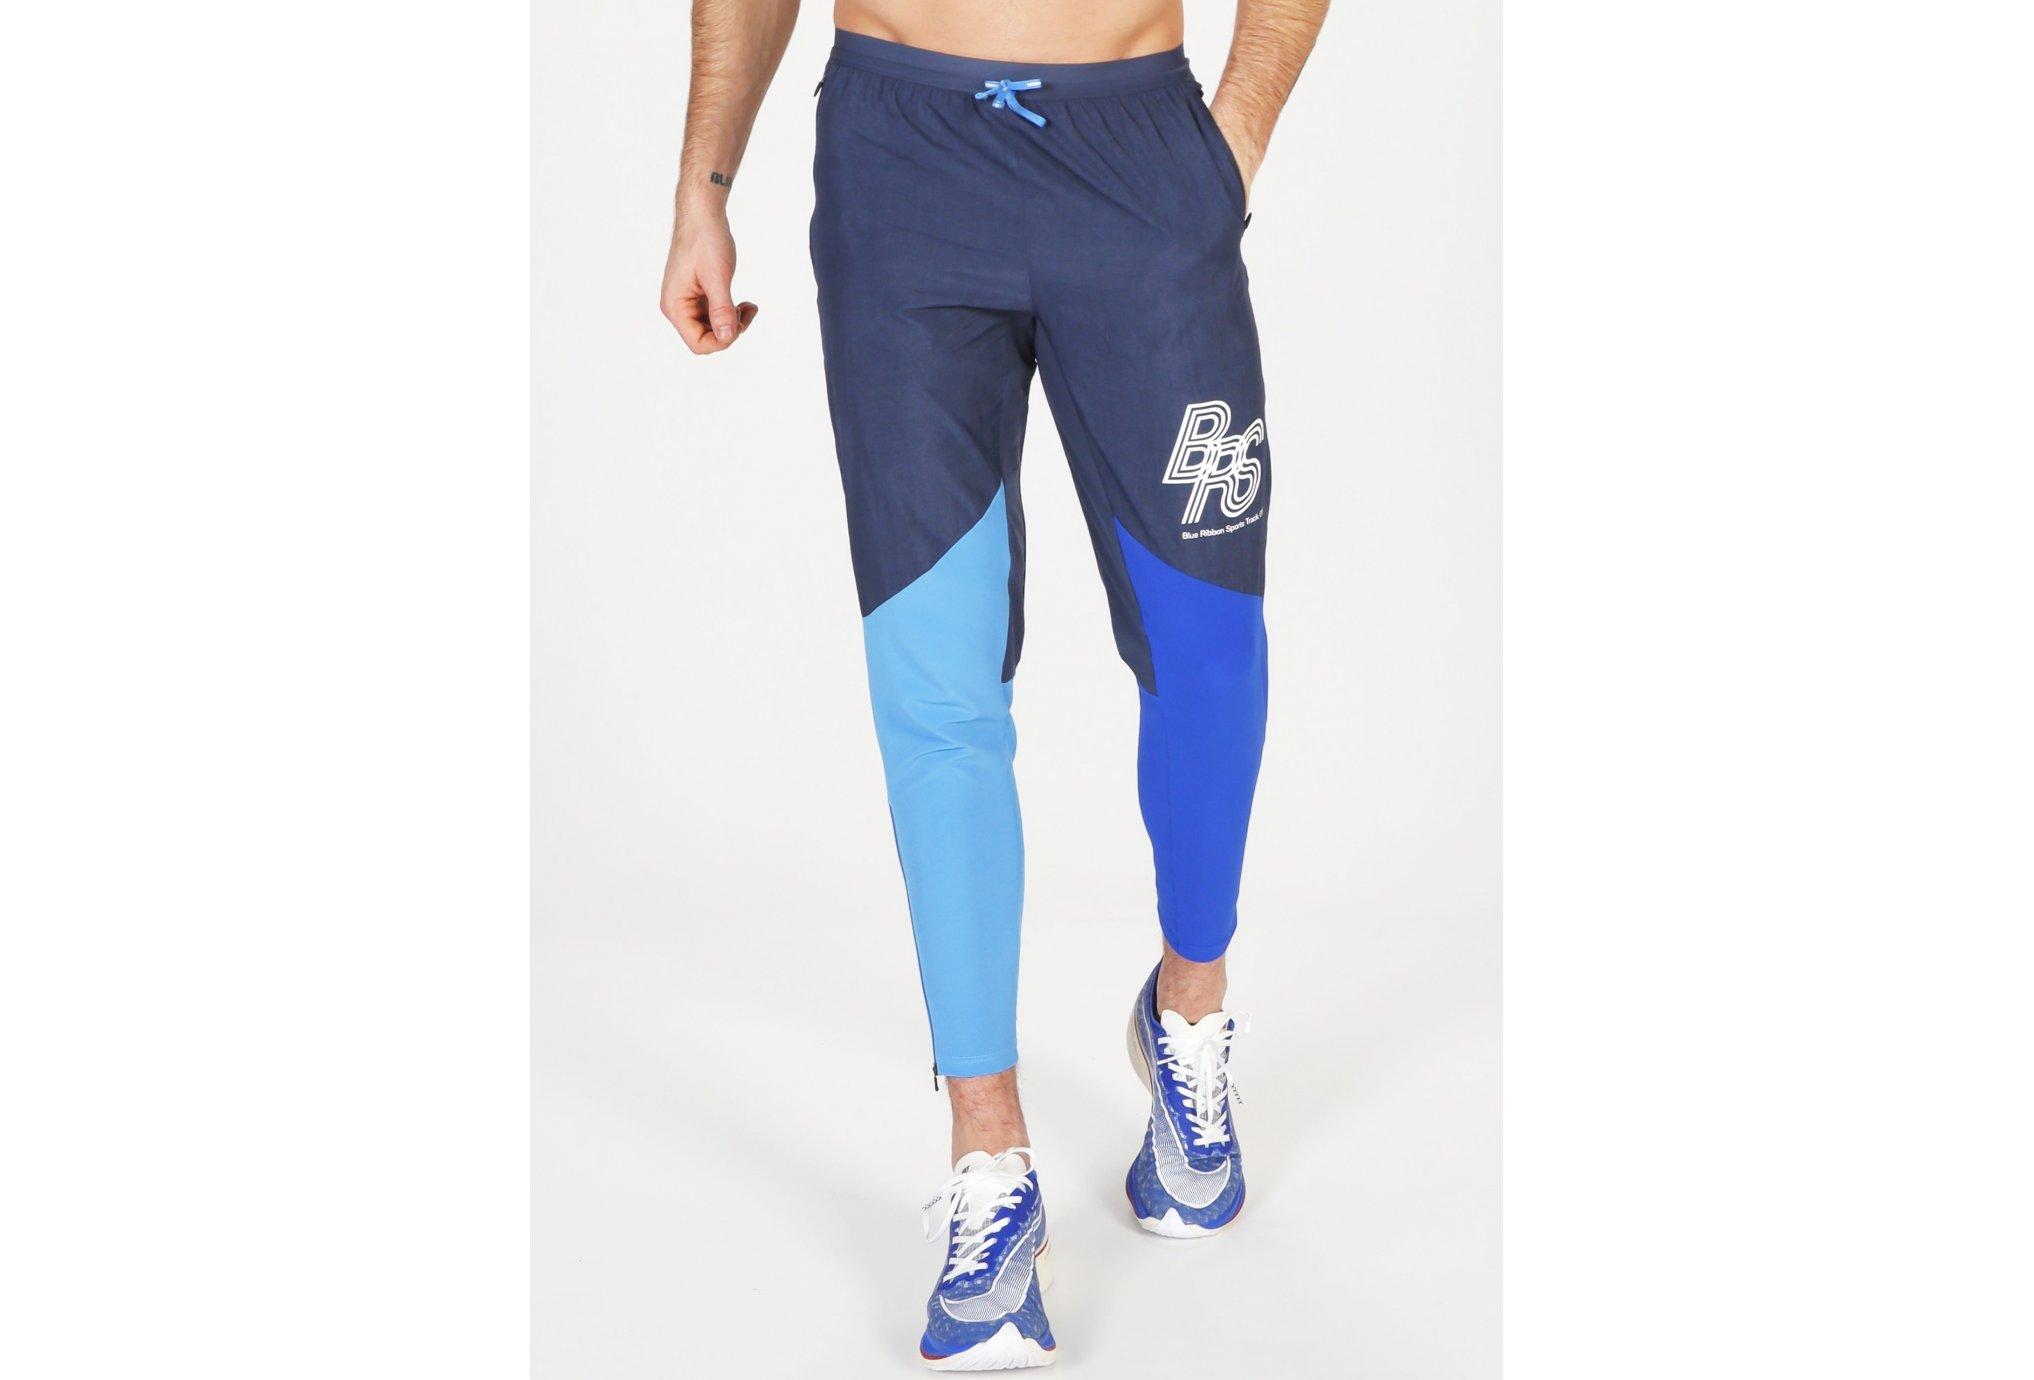 Nike Phenom Elite BRS M vêtement running homme